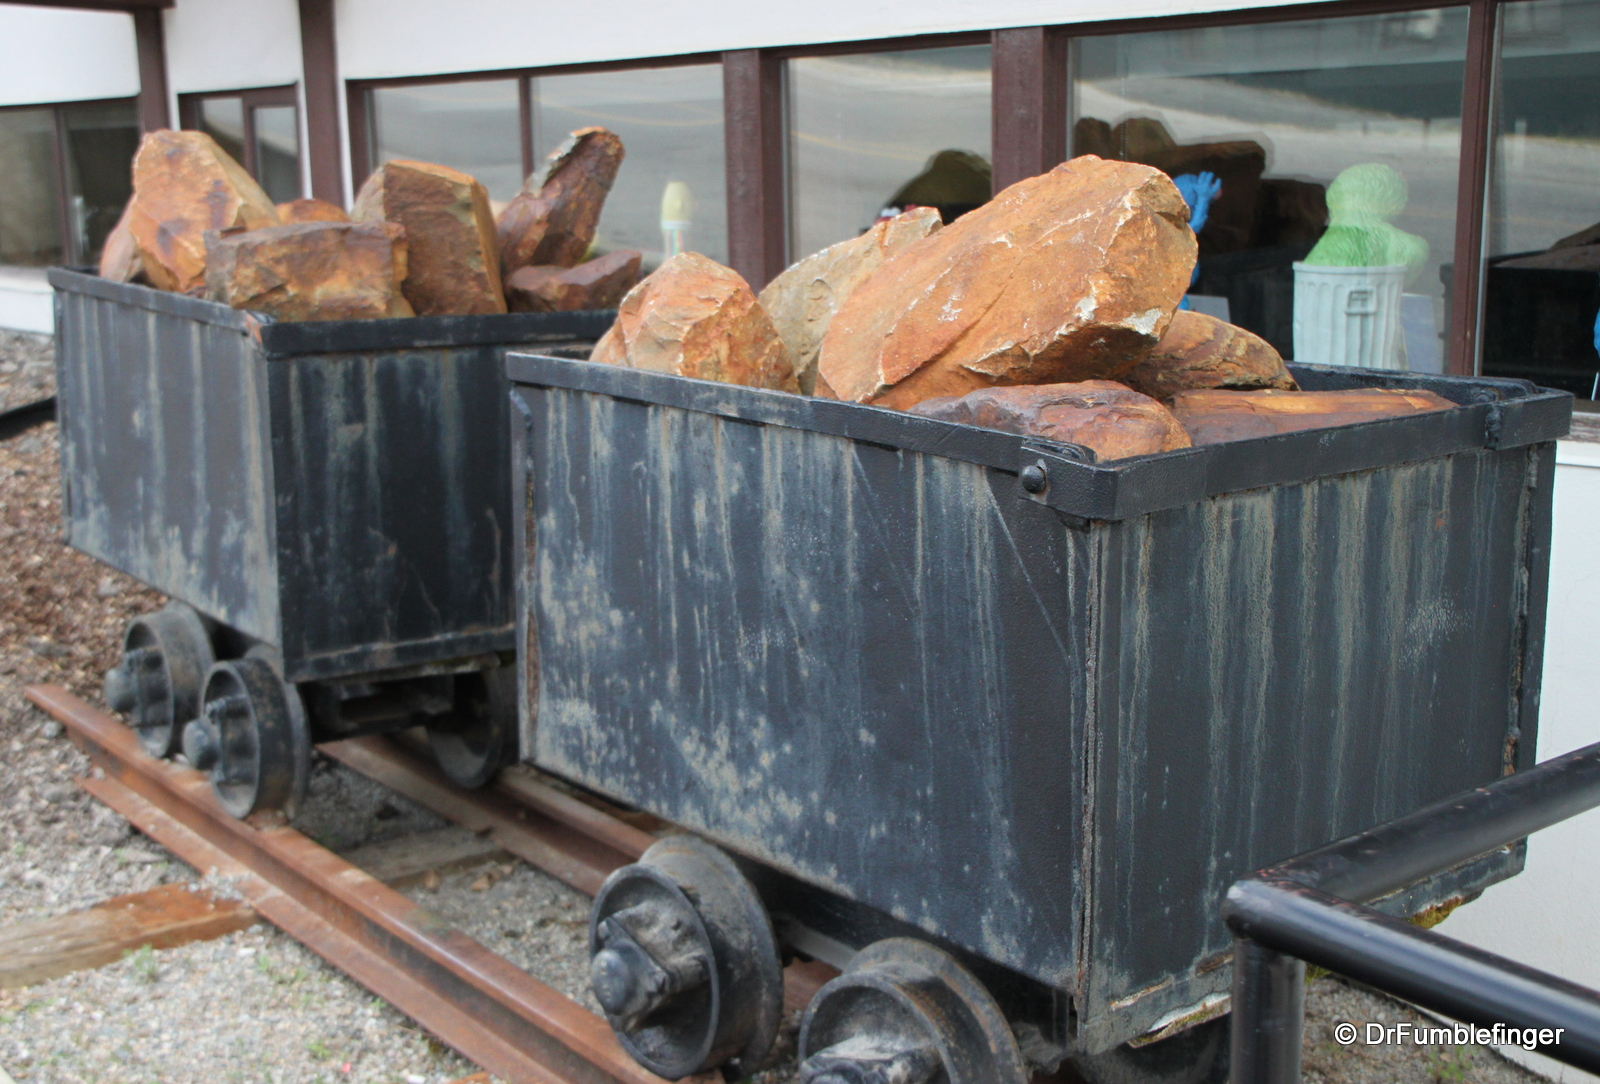 Mining carts and ore, Kimberley Library